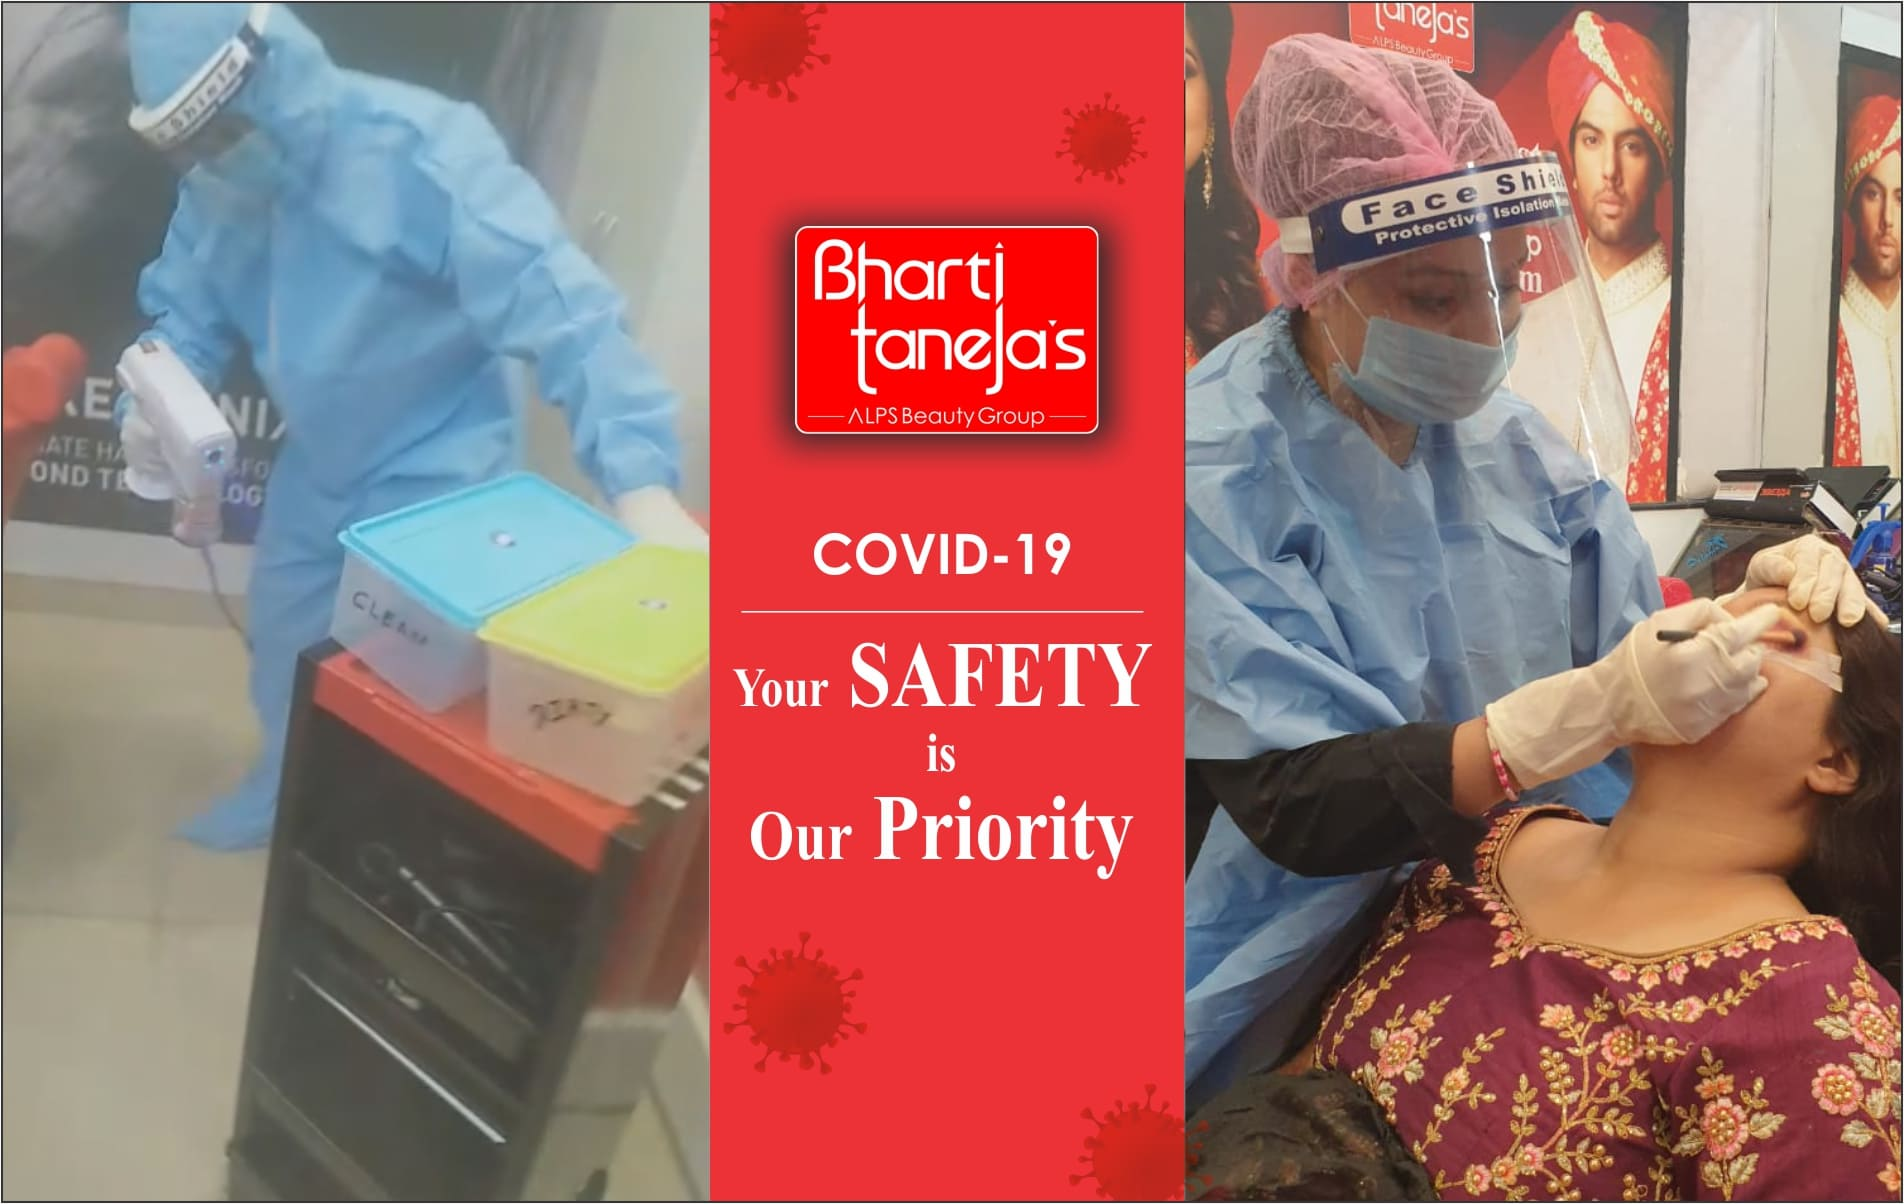 dr. bharti taneja's alps beauty group - beauty clinic